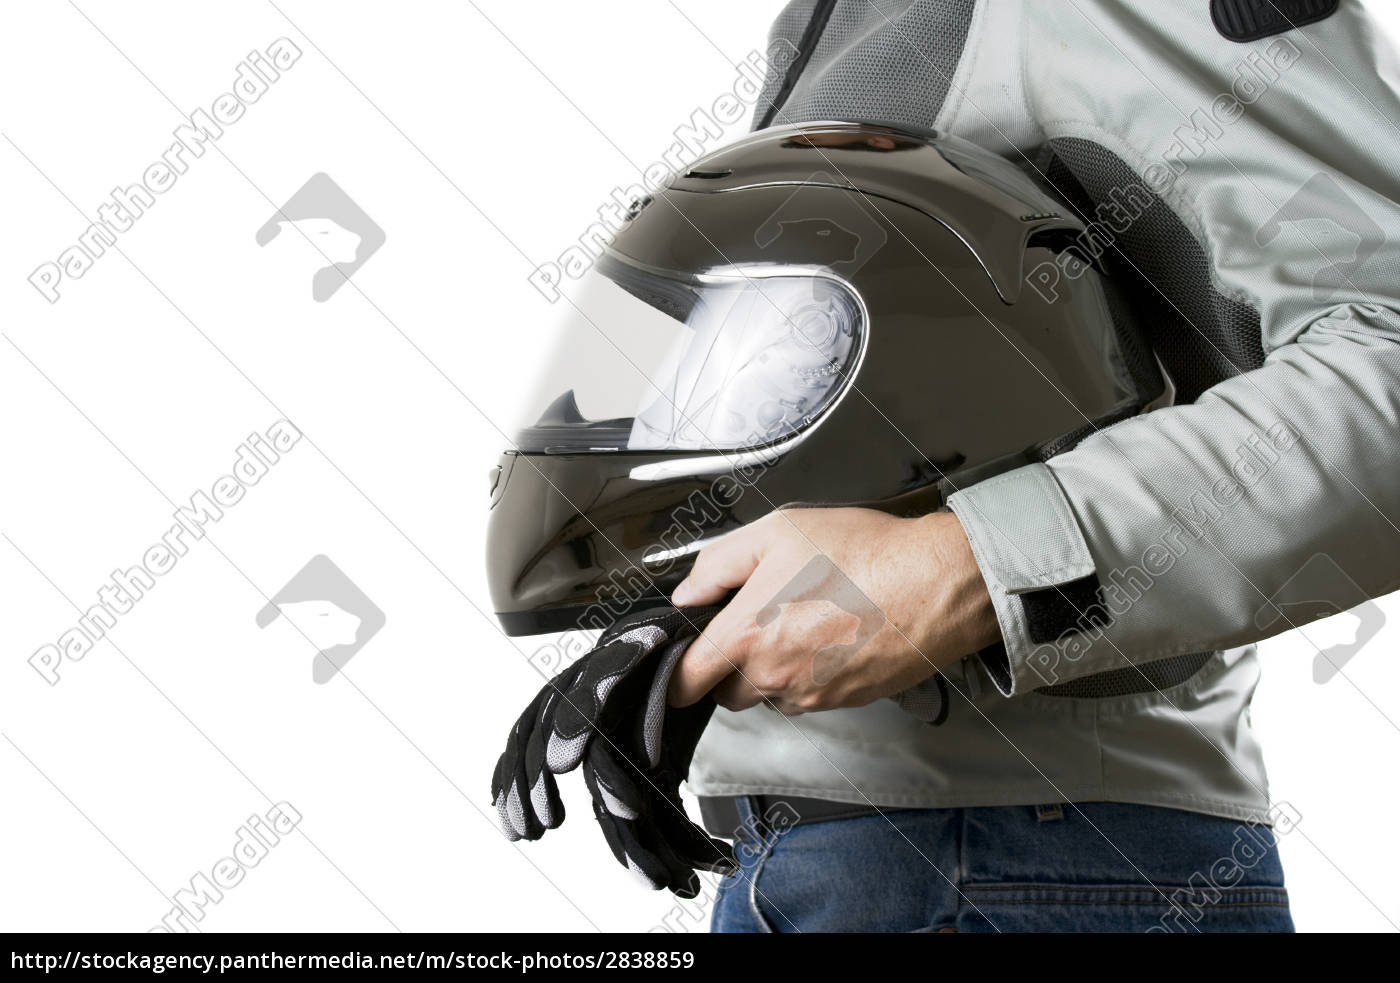 motorcyclist - 2838859